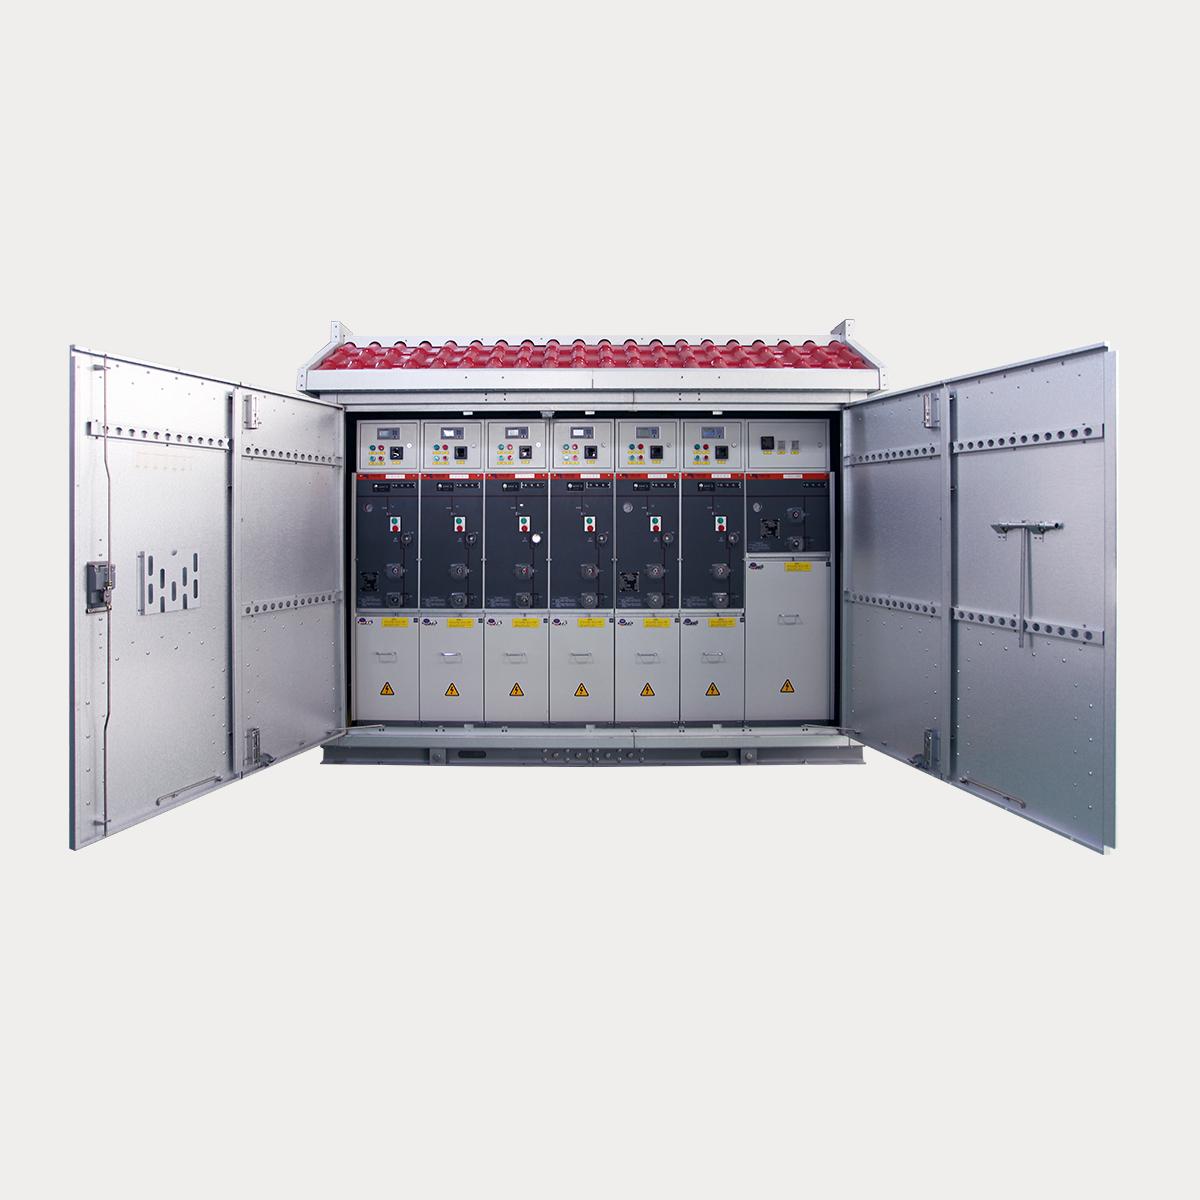 DFW7-12 户外高压交流电缆分接箱(10kV户外开关箱)